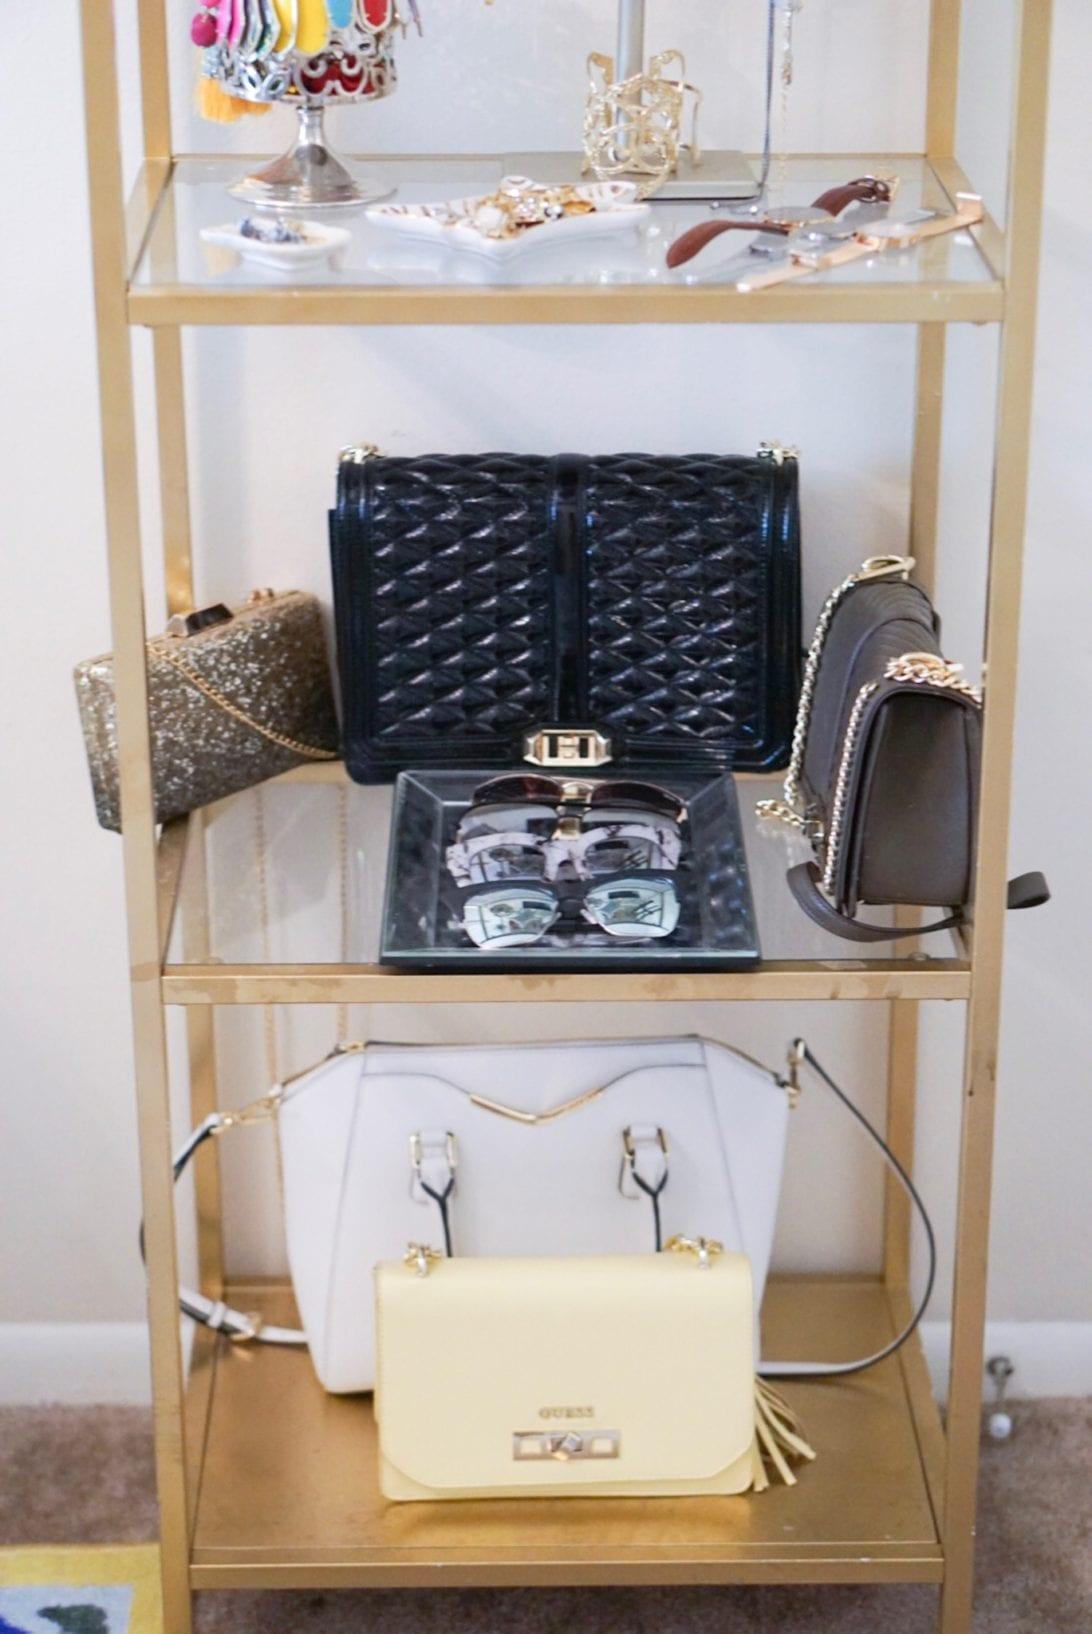 ikea shelf, ikea glass shelf, accessory display, office display shelf, display shelf, closet display shelf